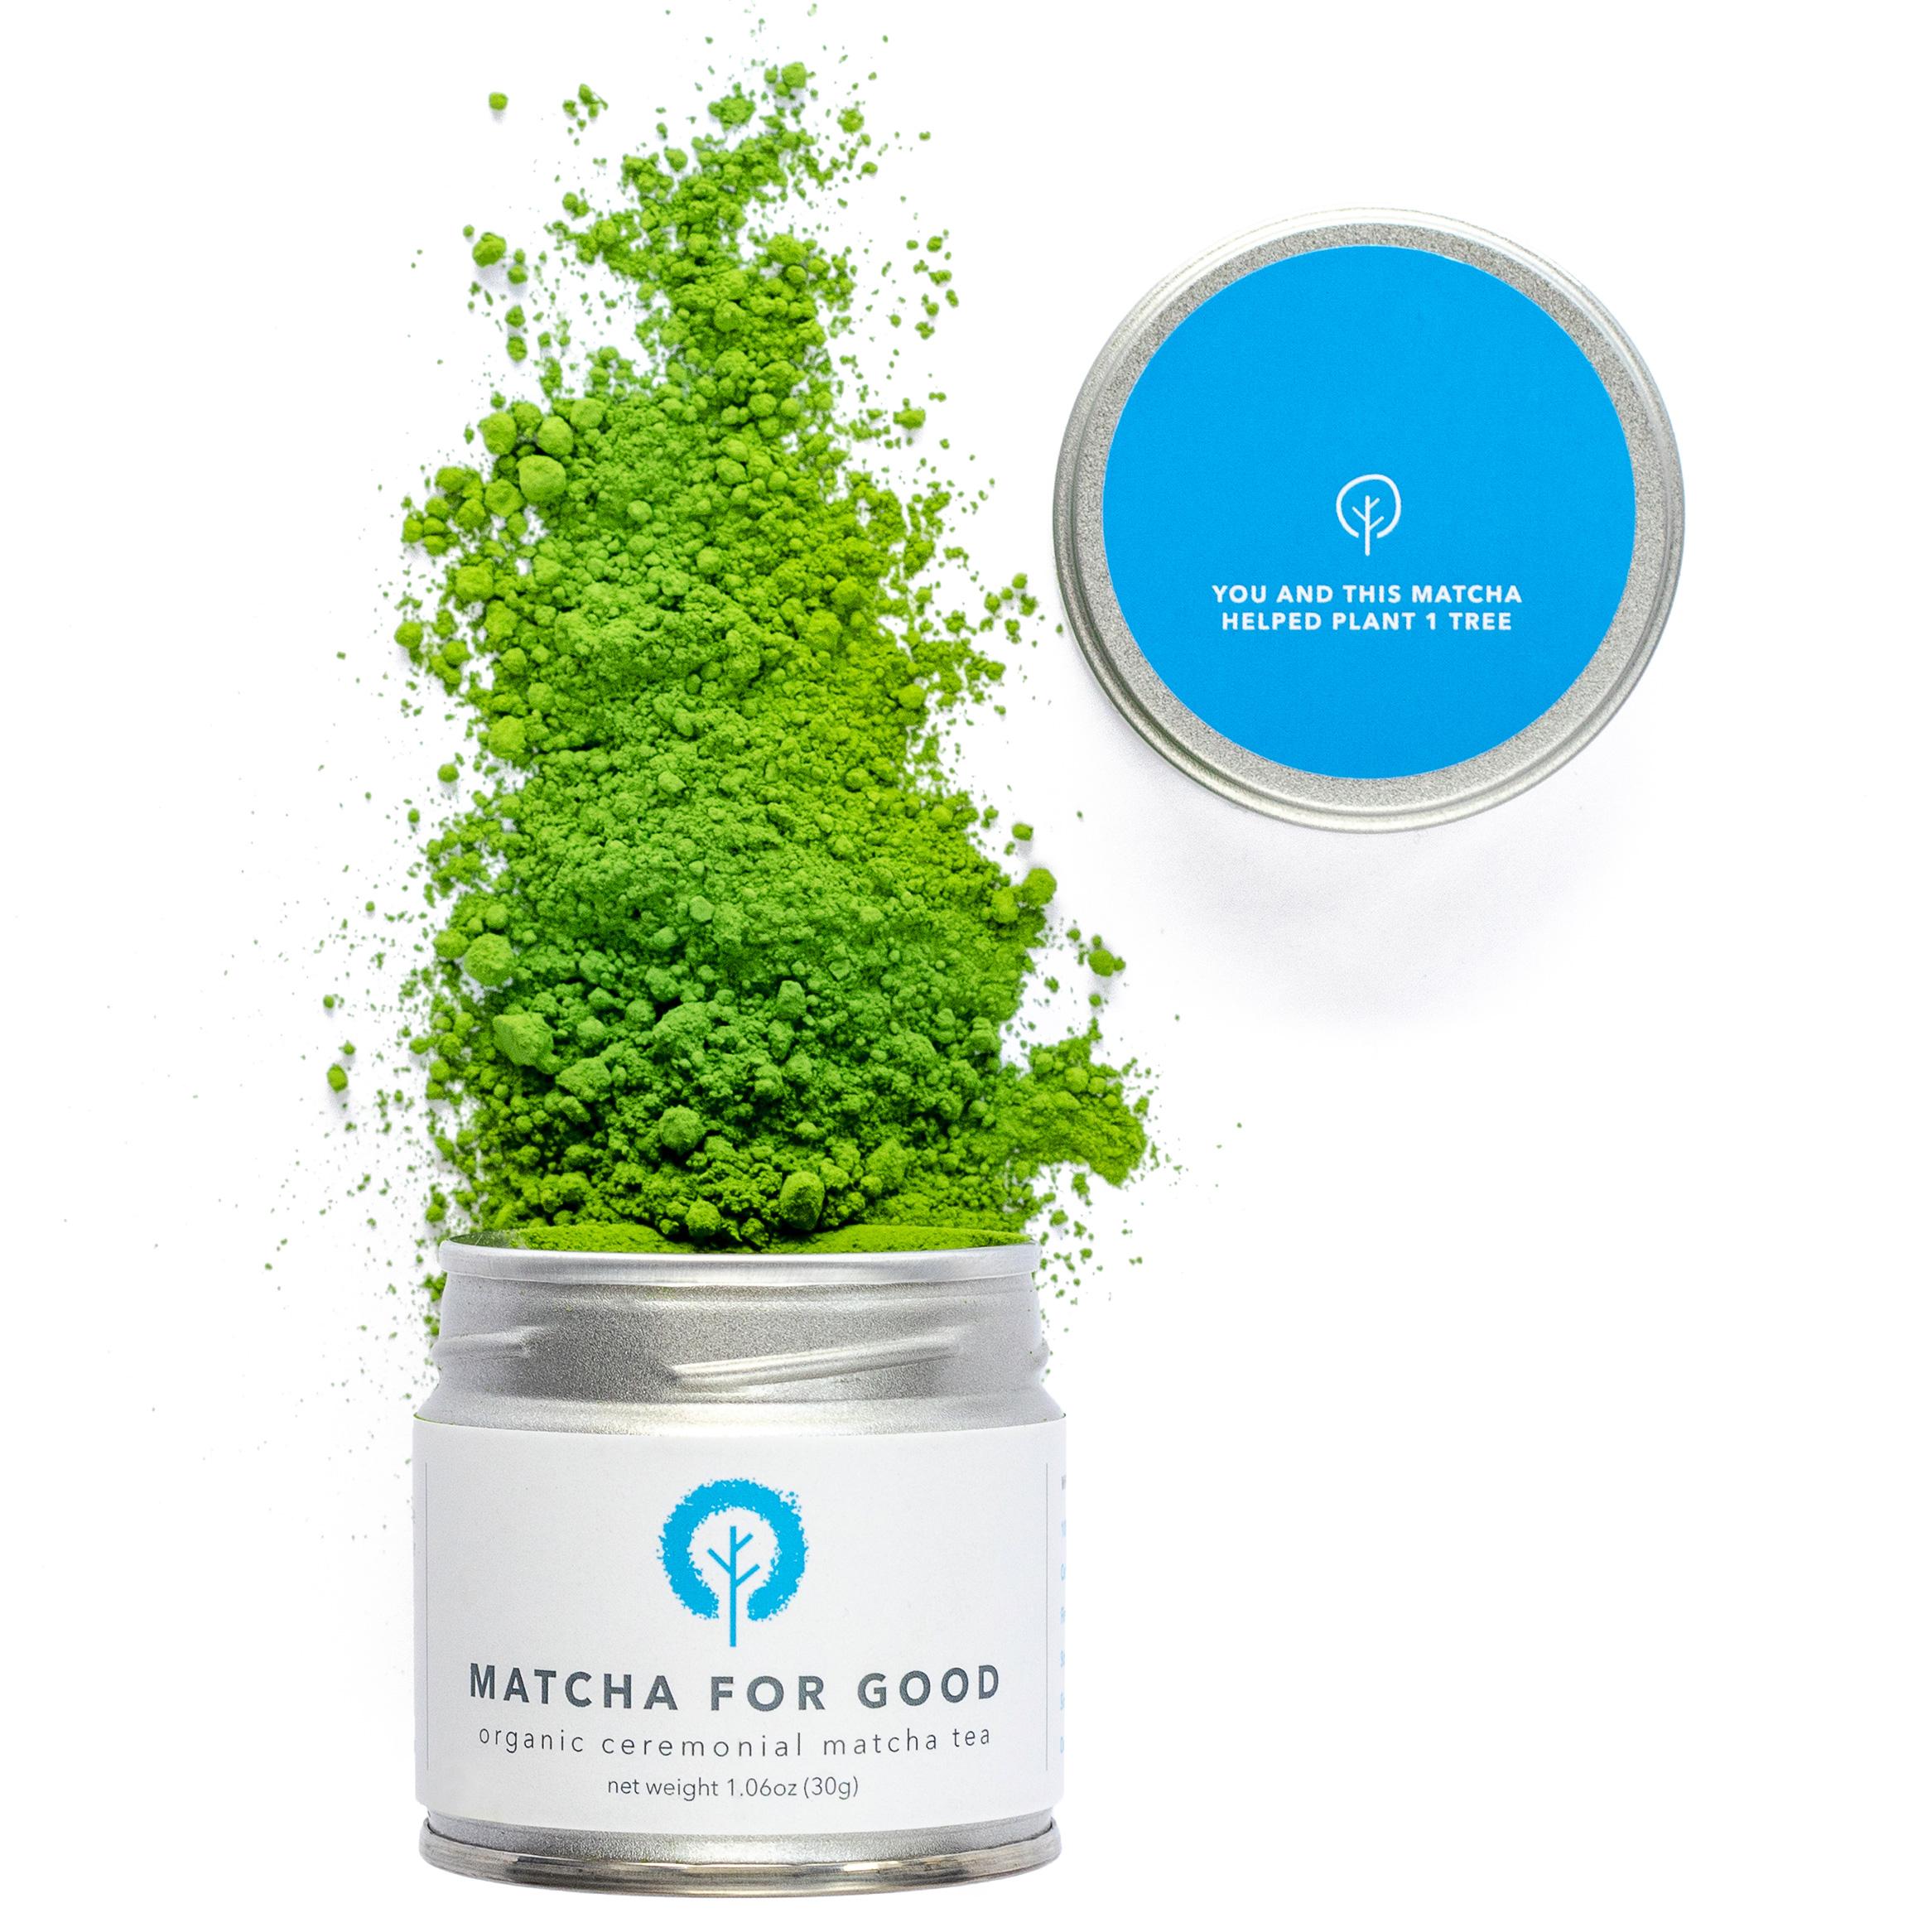 Matcha for Good - organic ceremonial matcha powder and tin _ white background.jpg